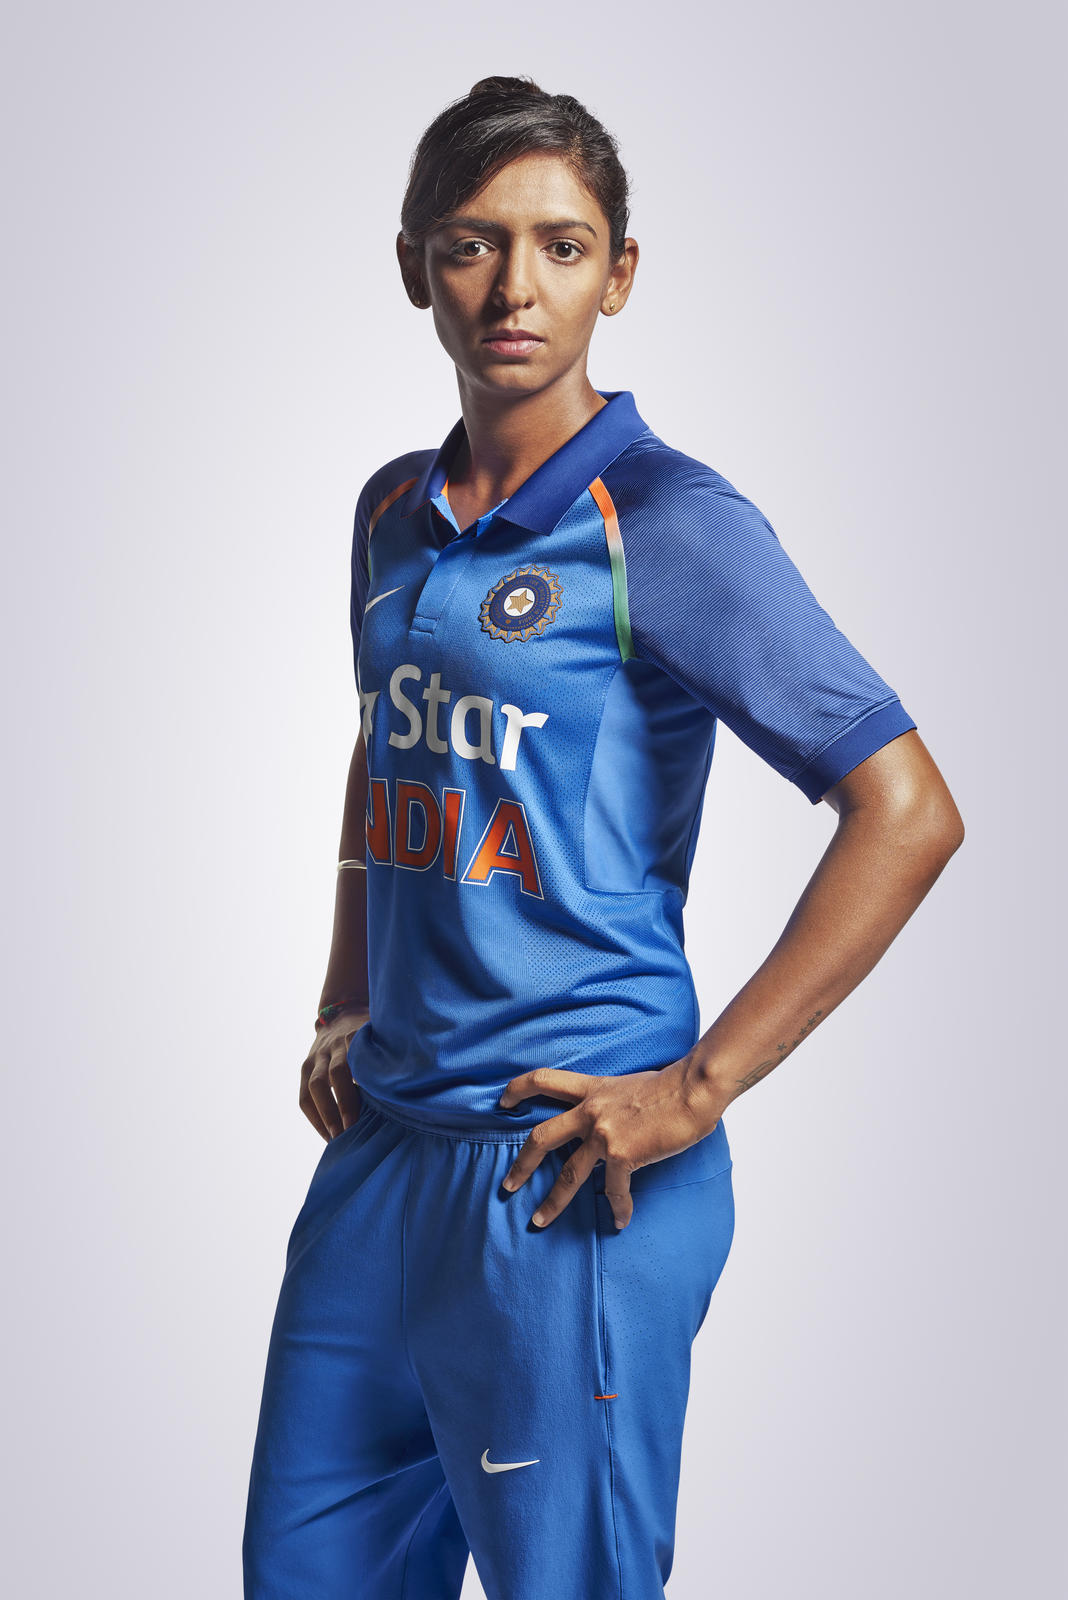 afcc5ce80 Nike Unveils New Team India Cricket Kit - Nike News